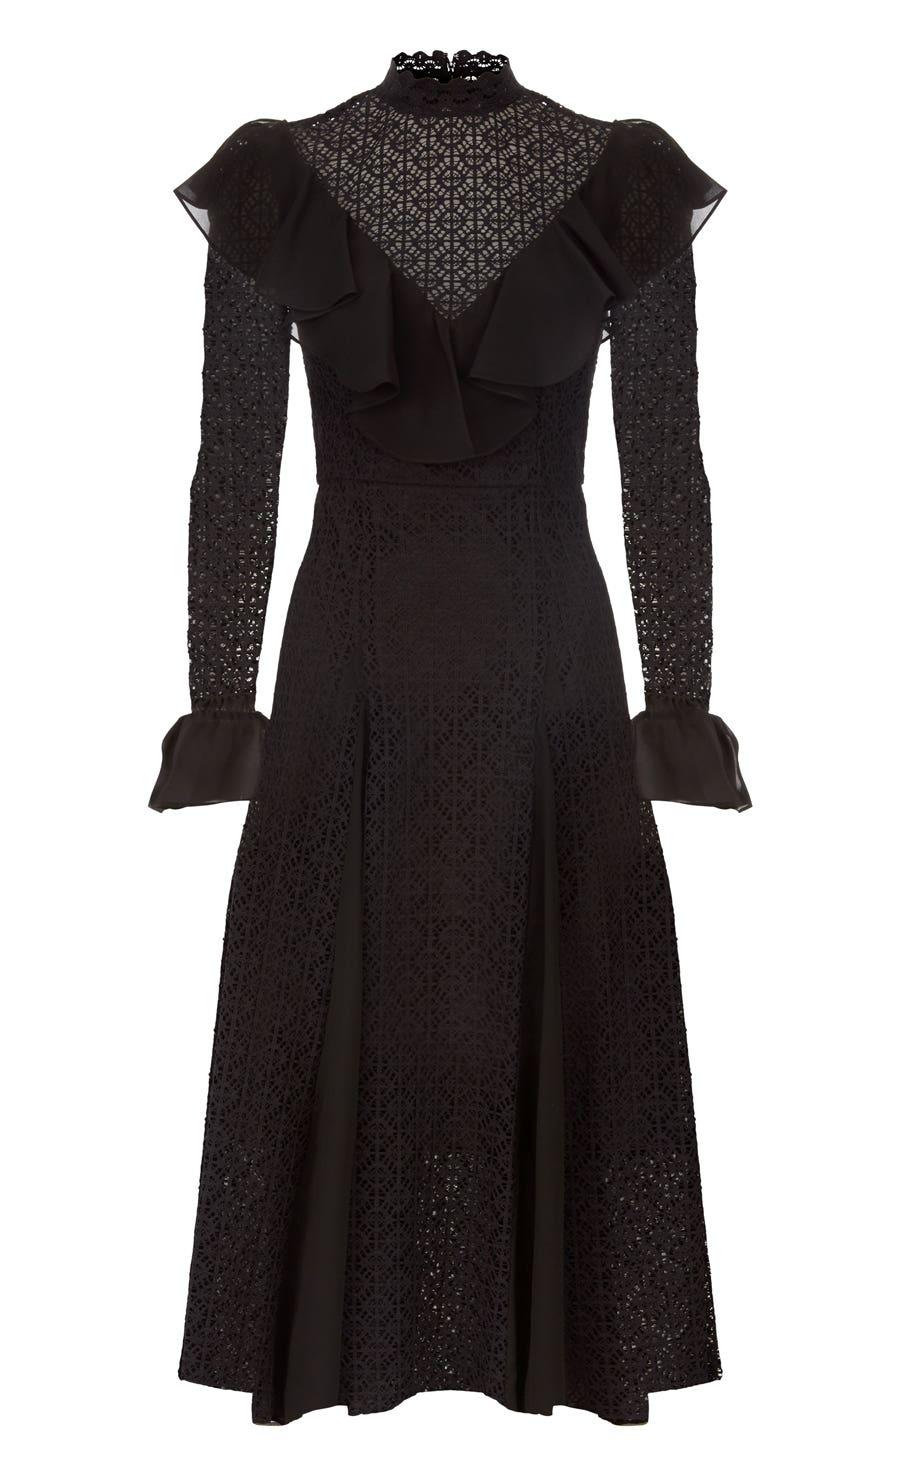 Prairie Lace Ruffle Dress, Black